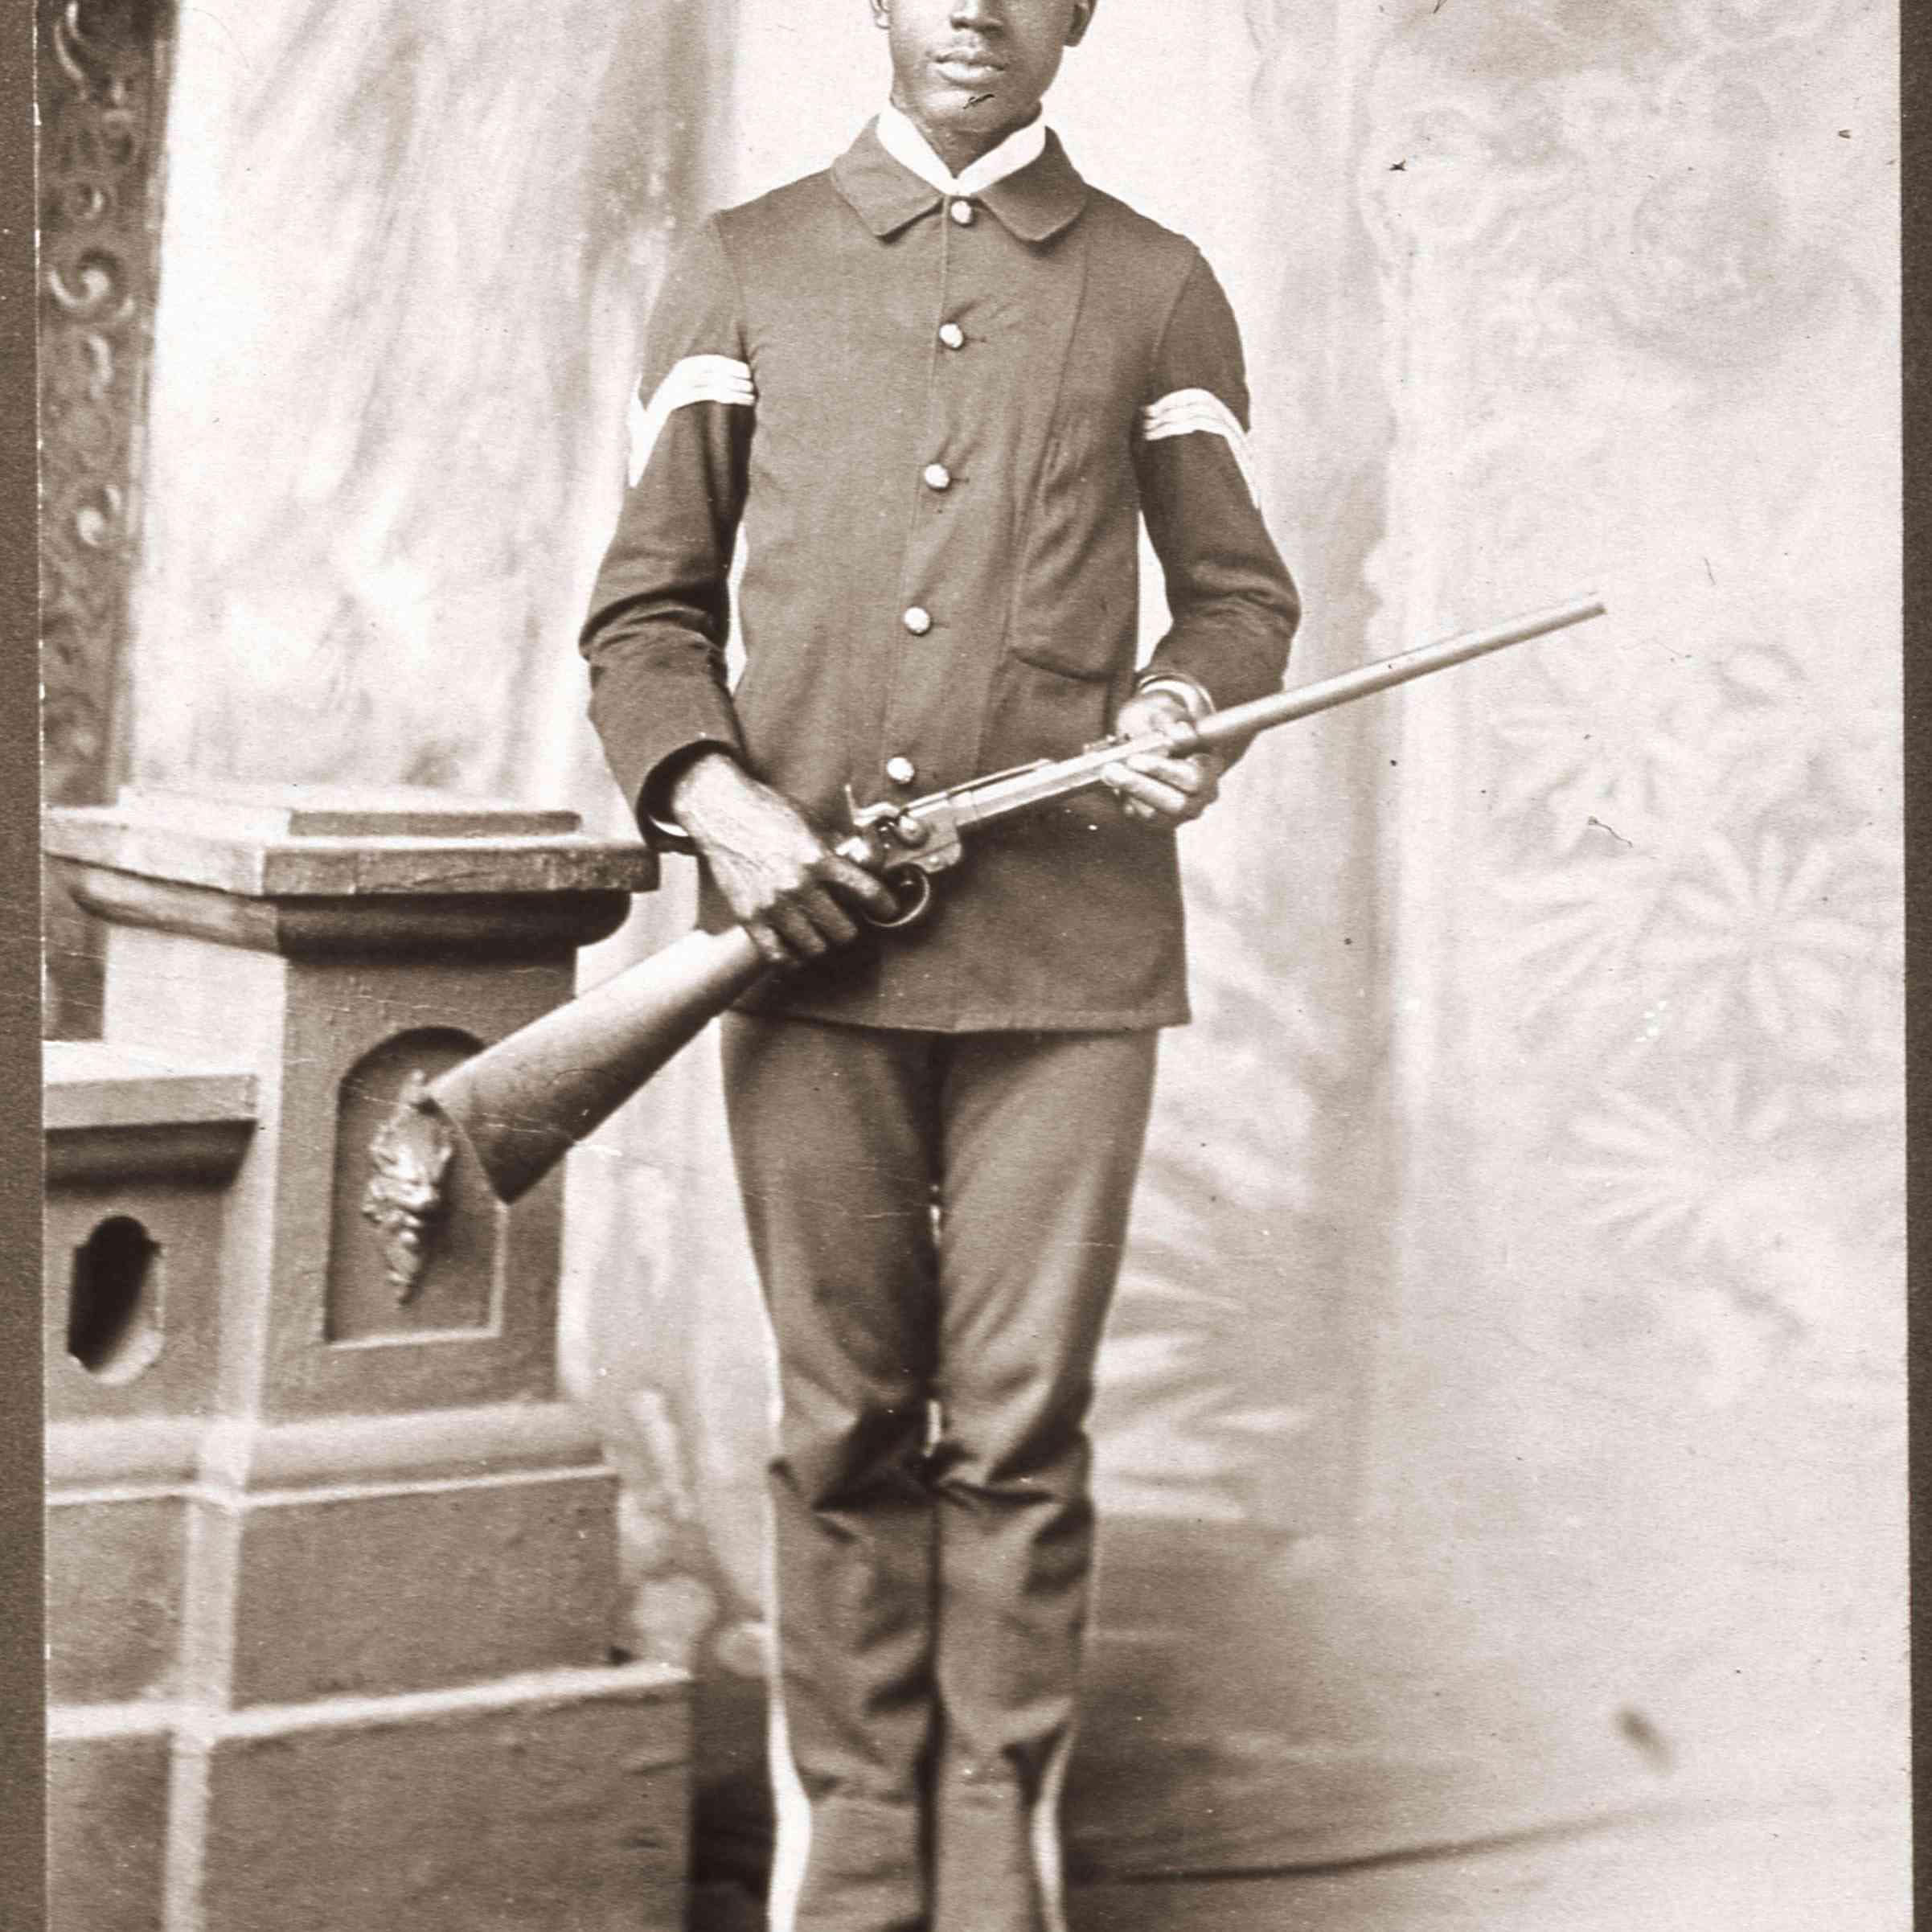 Portrait Of A Buffalo Soldier